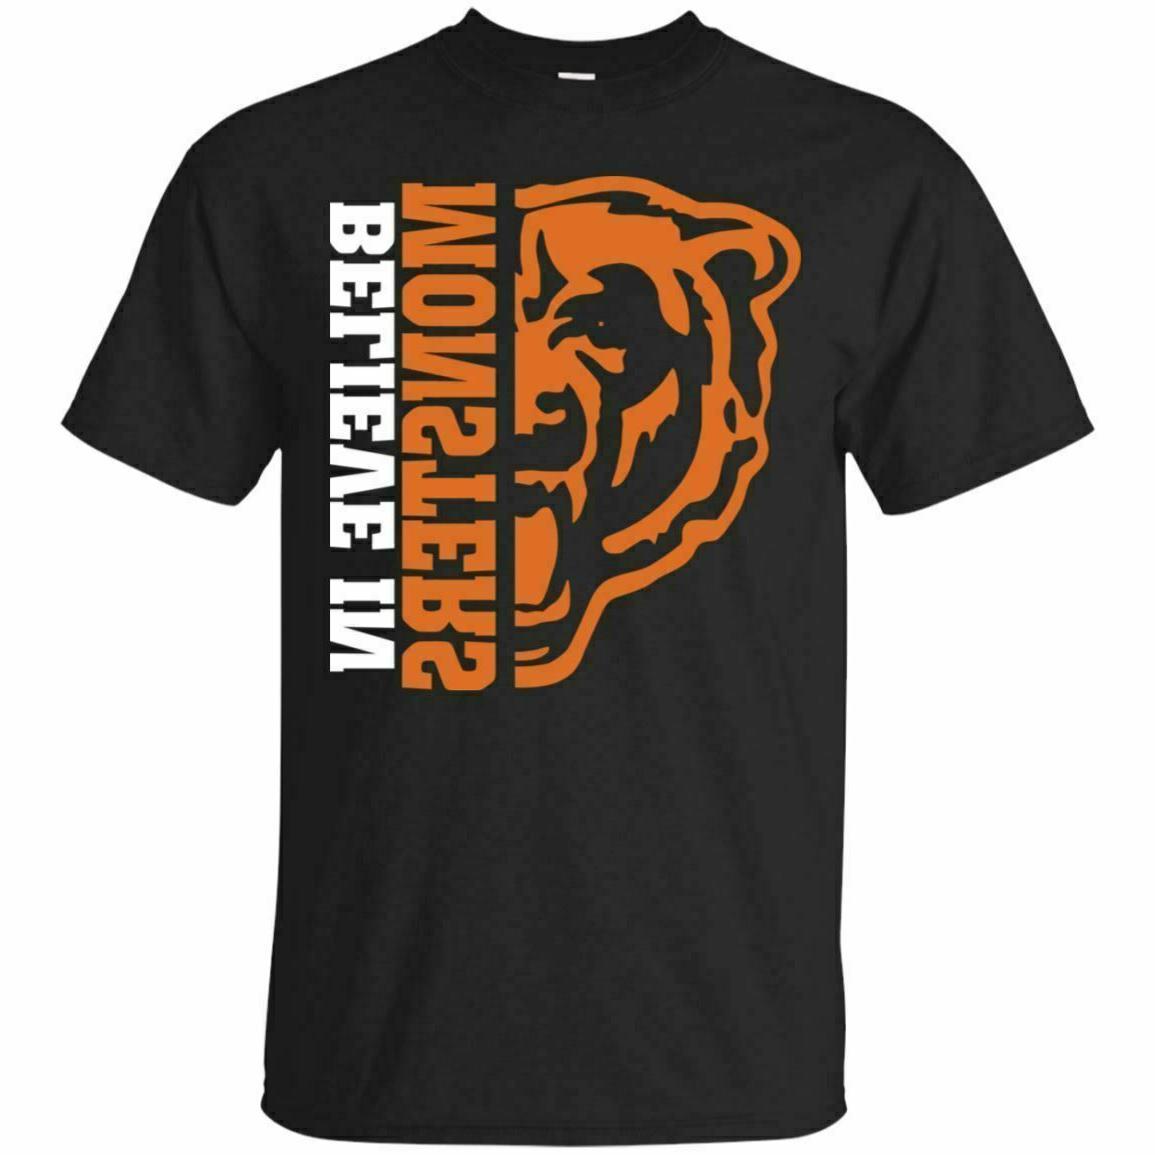 chicago football shirt believe in monster t